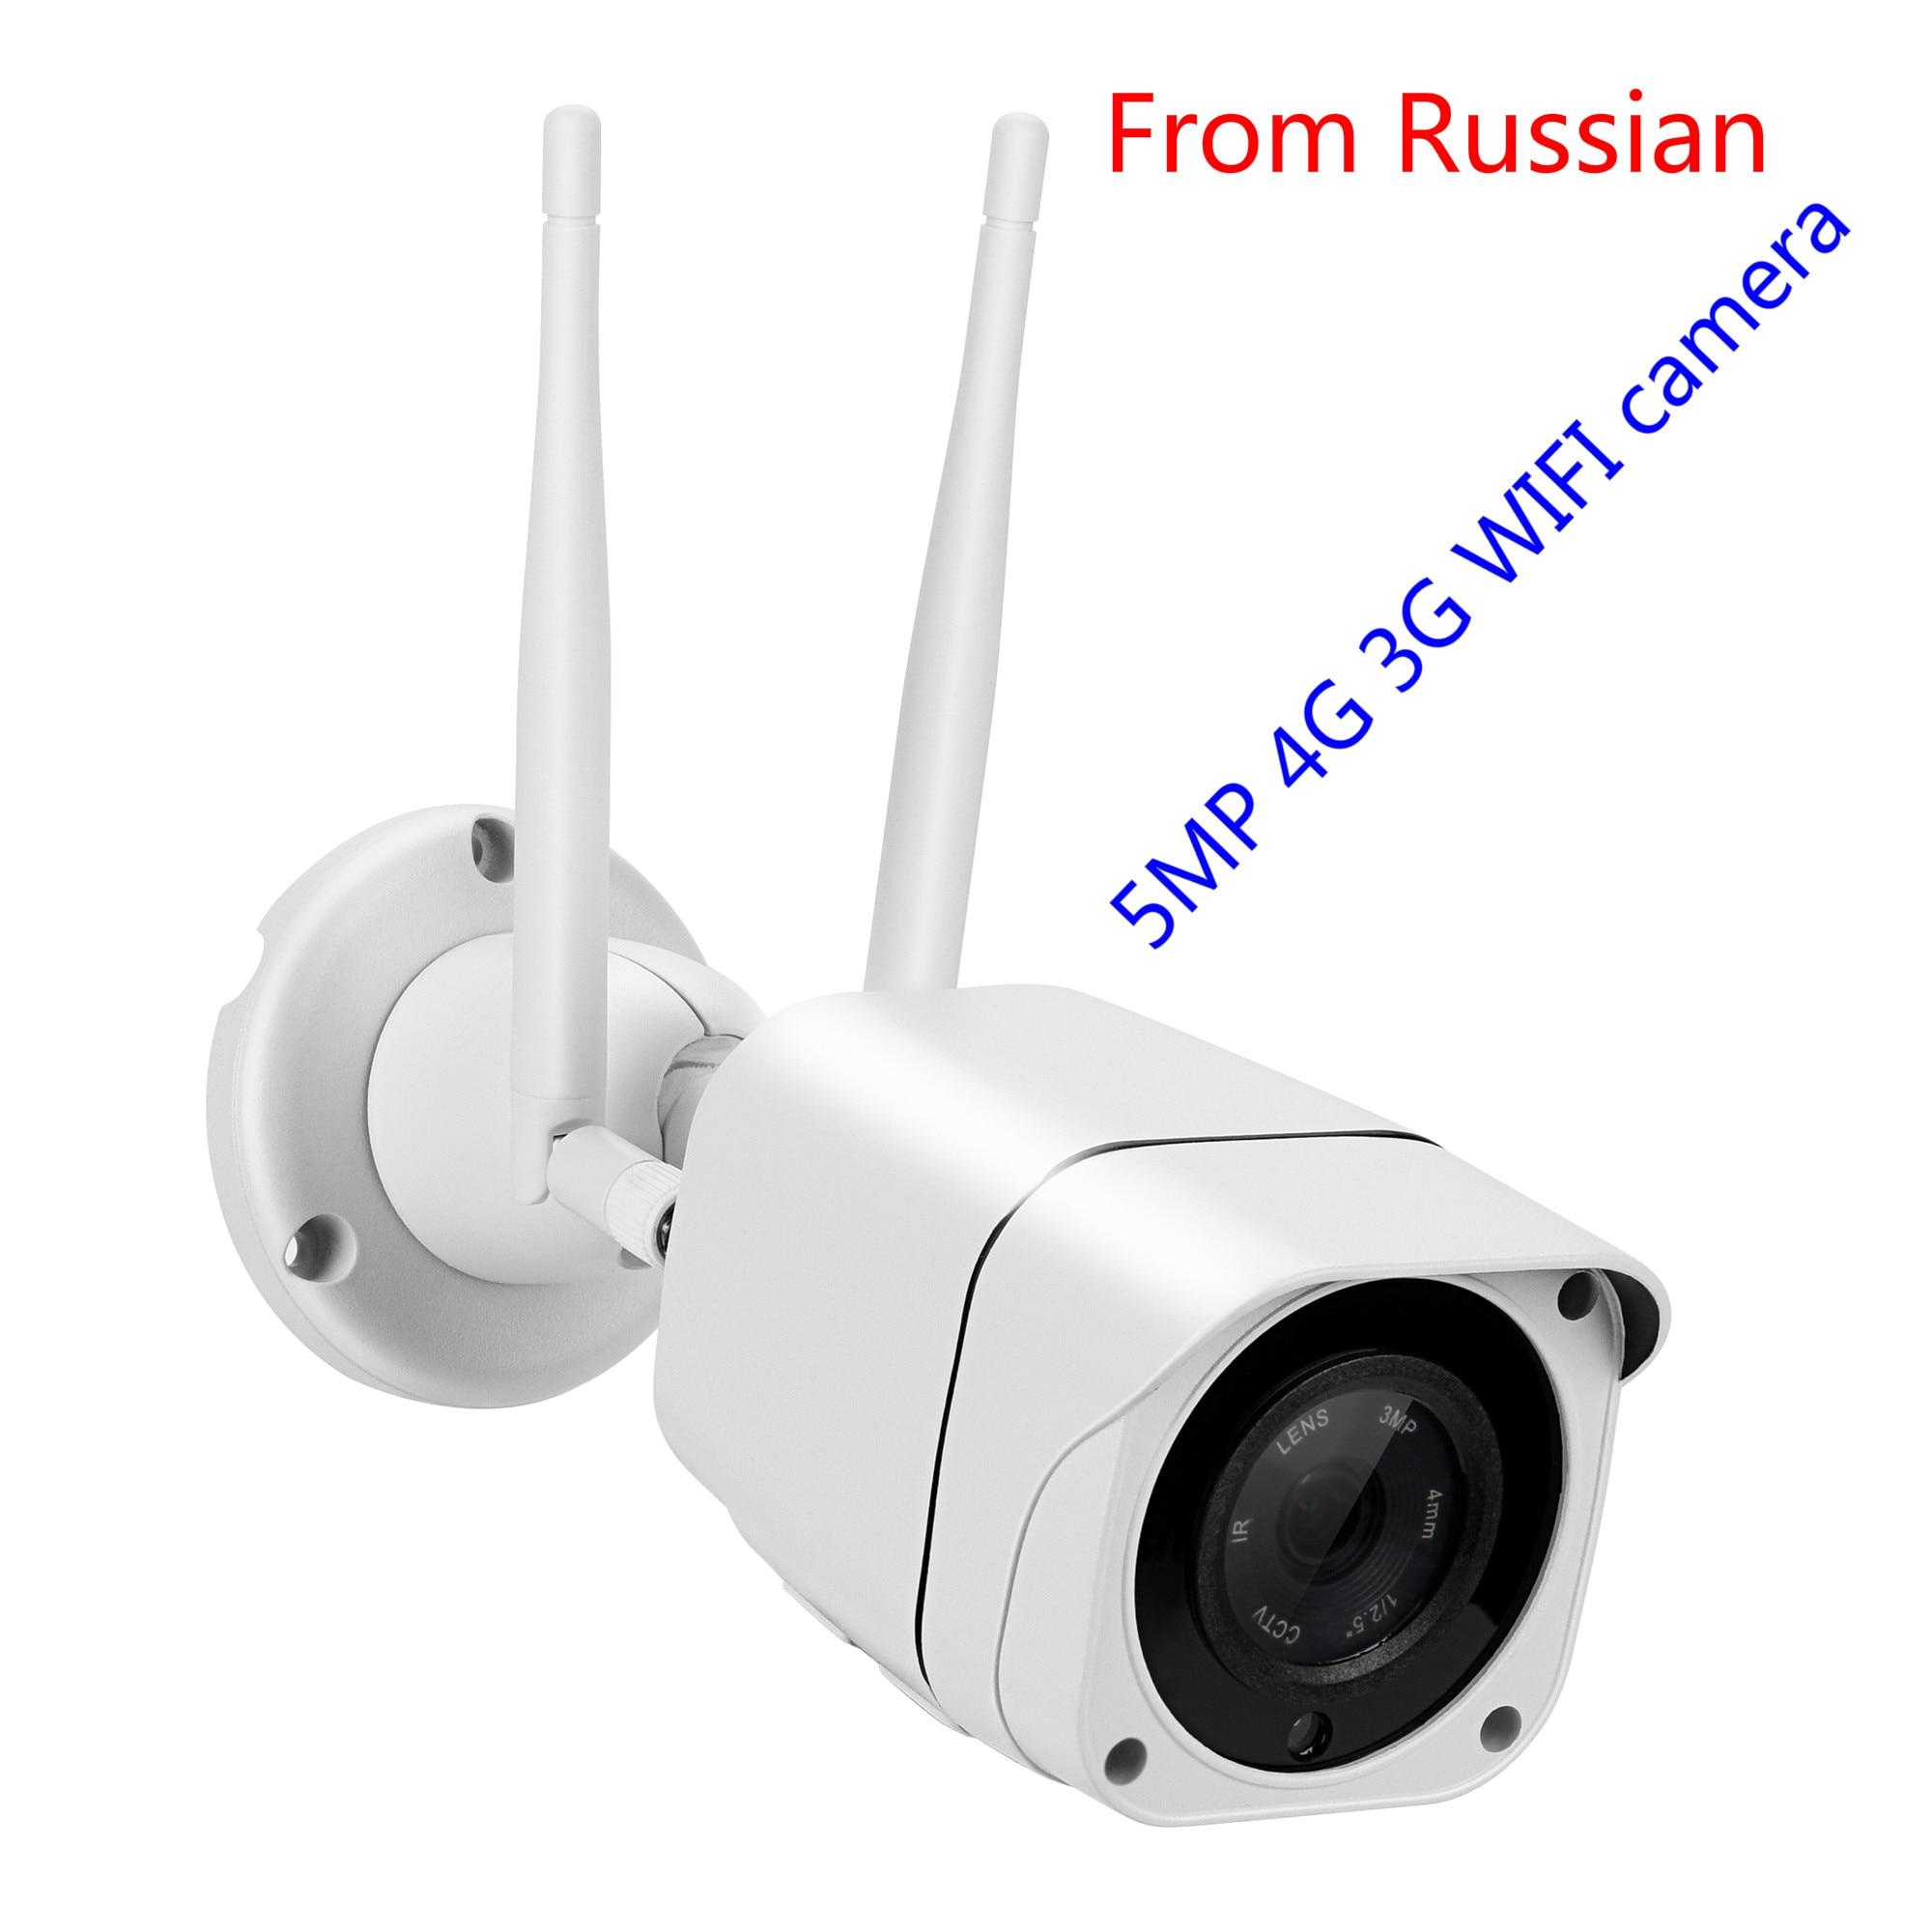 5M 3g 4g draht freies HD sicherheit kameras 5MP Sony sensor 4g wifi CCTV kameras IR vision outdoor P2P mini IP überwachung kamera